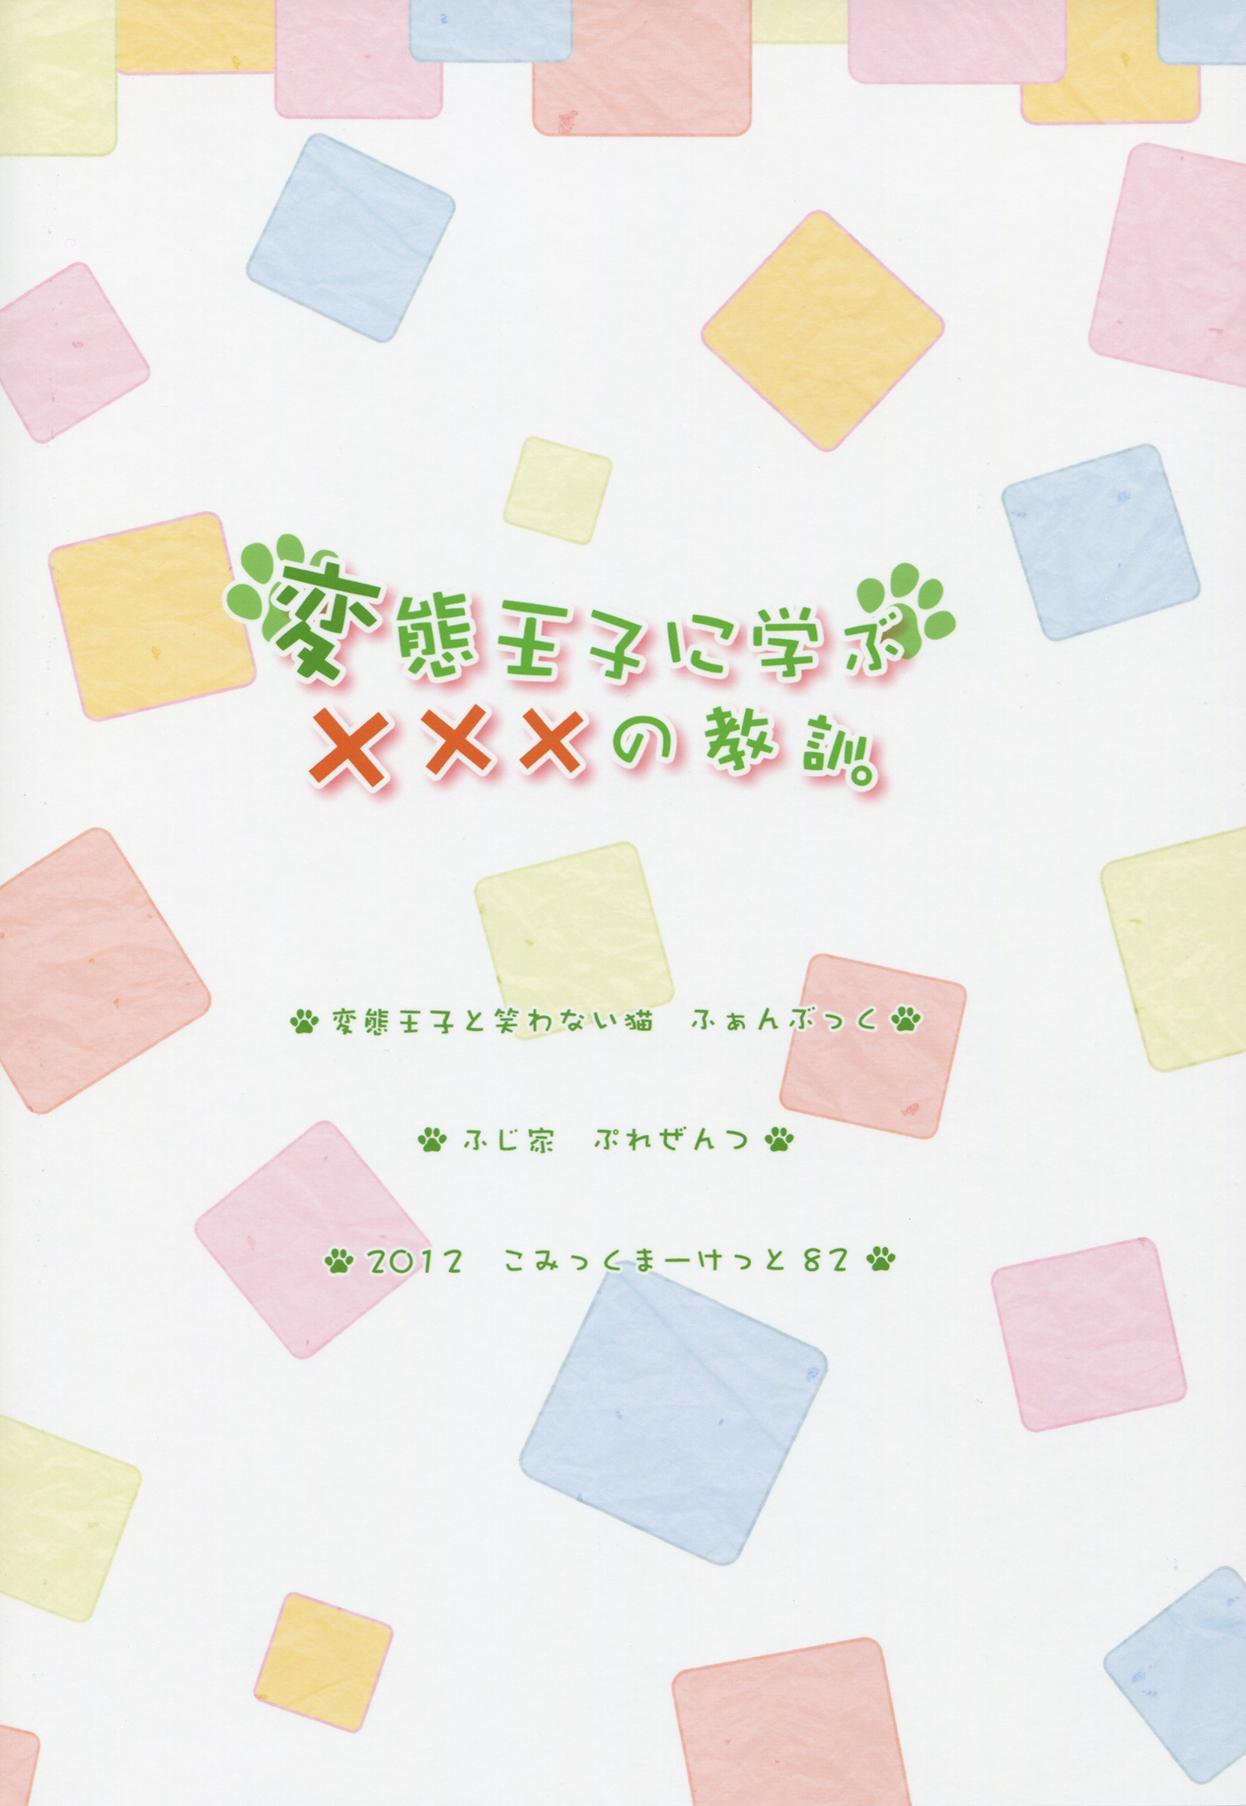 Hentai Ouji ni Manabu ××× no Kyoukun 23